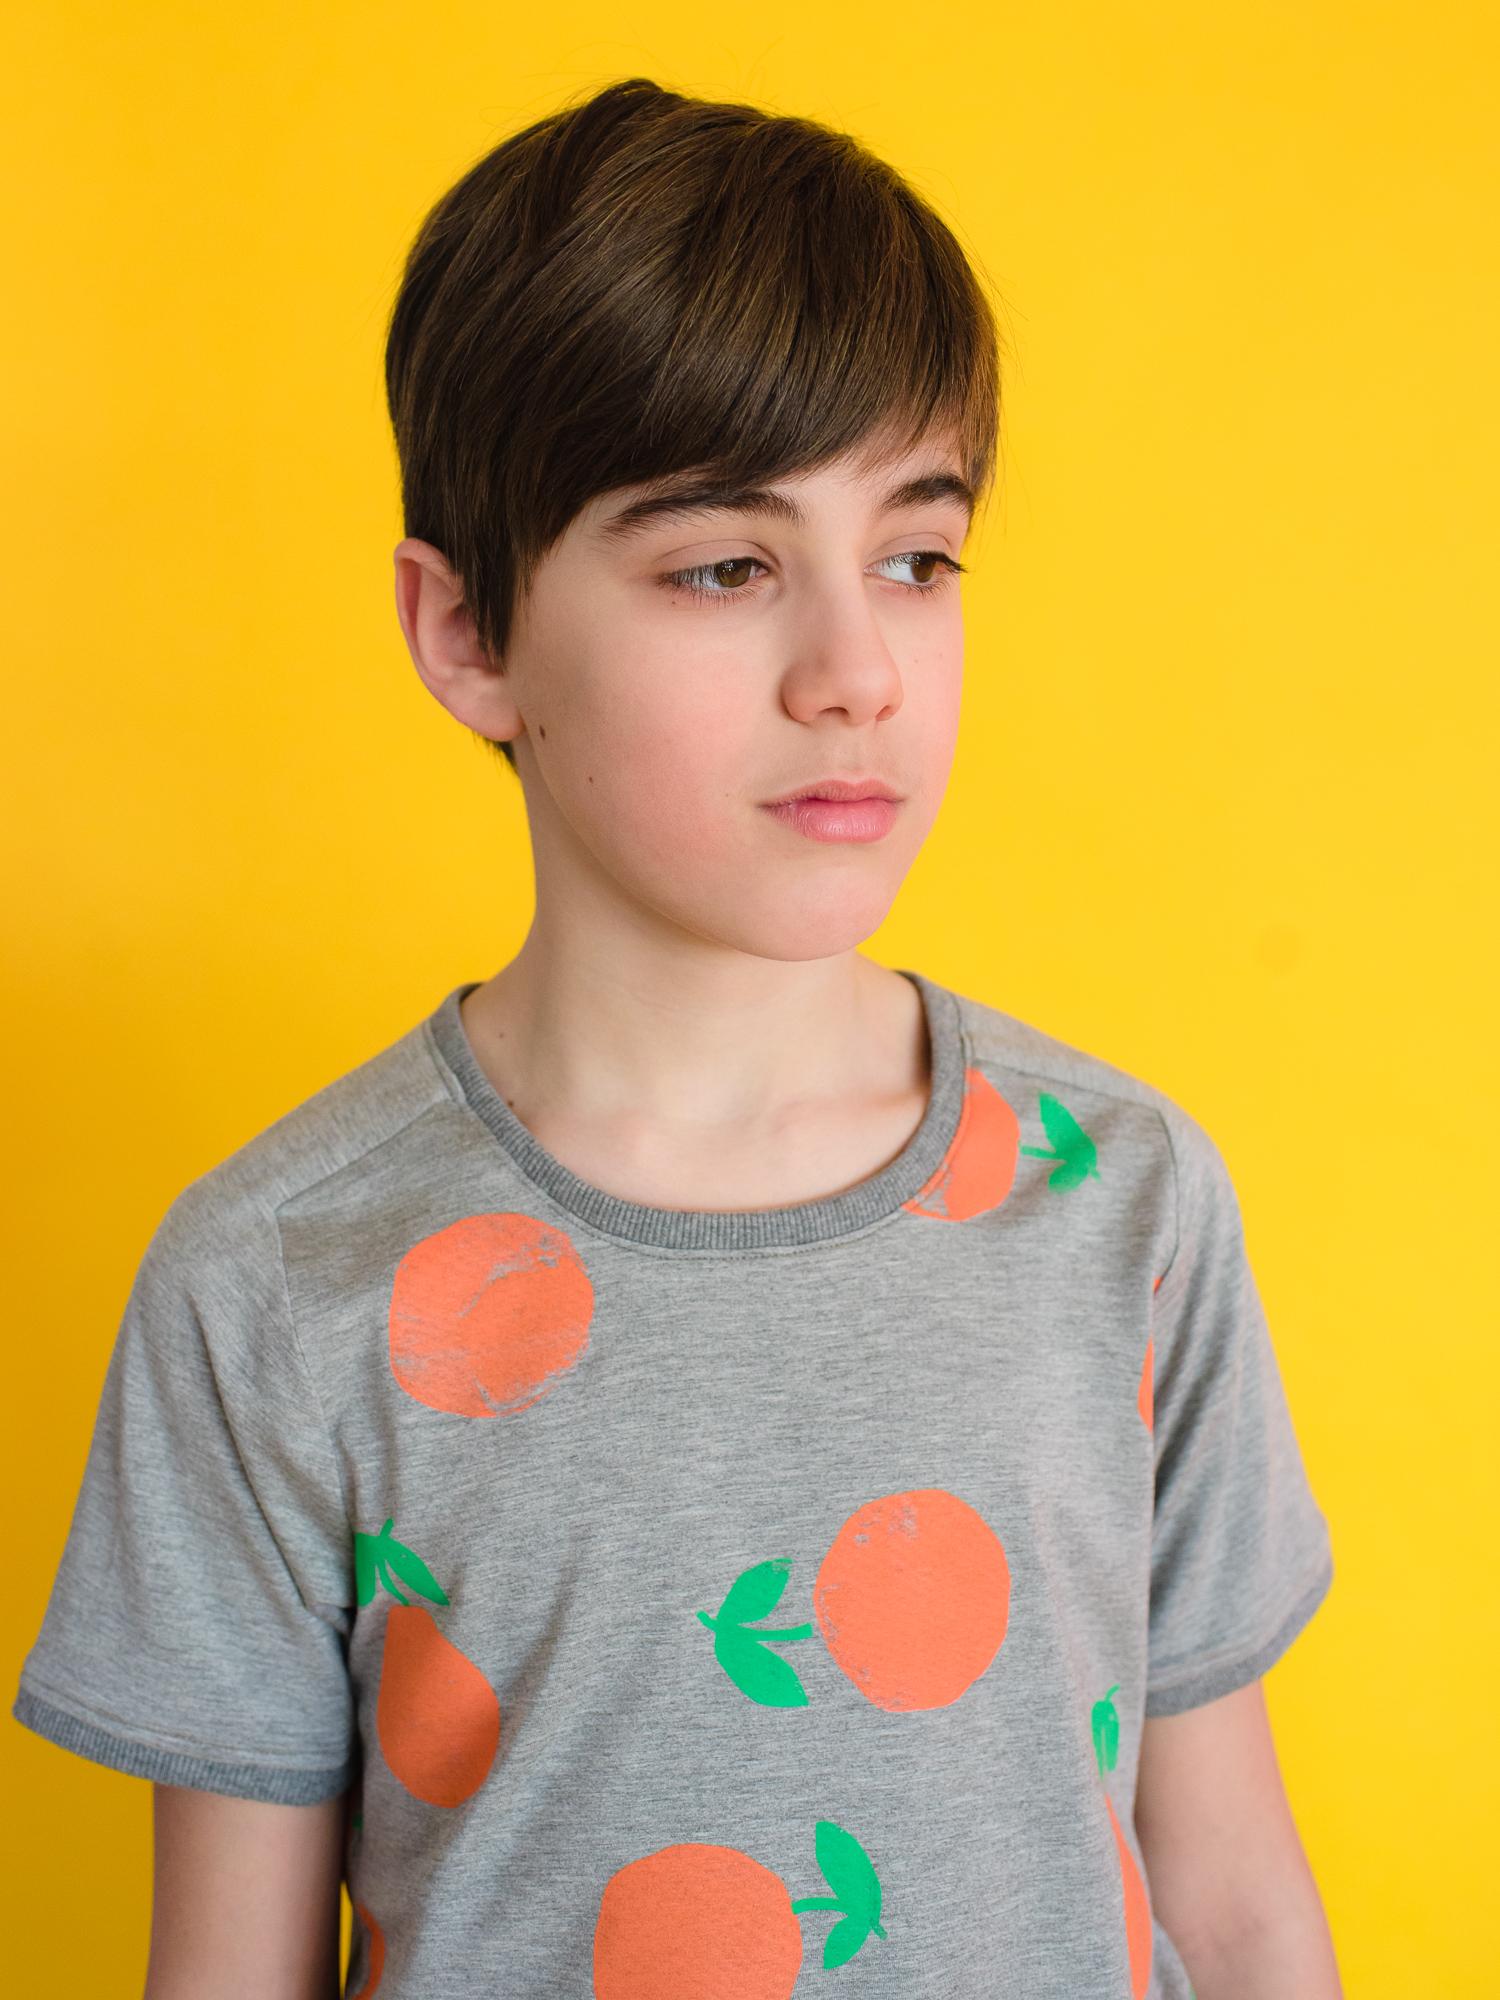 prp-kids-sewing-patterns25.jpg